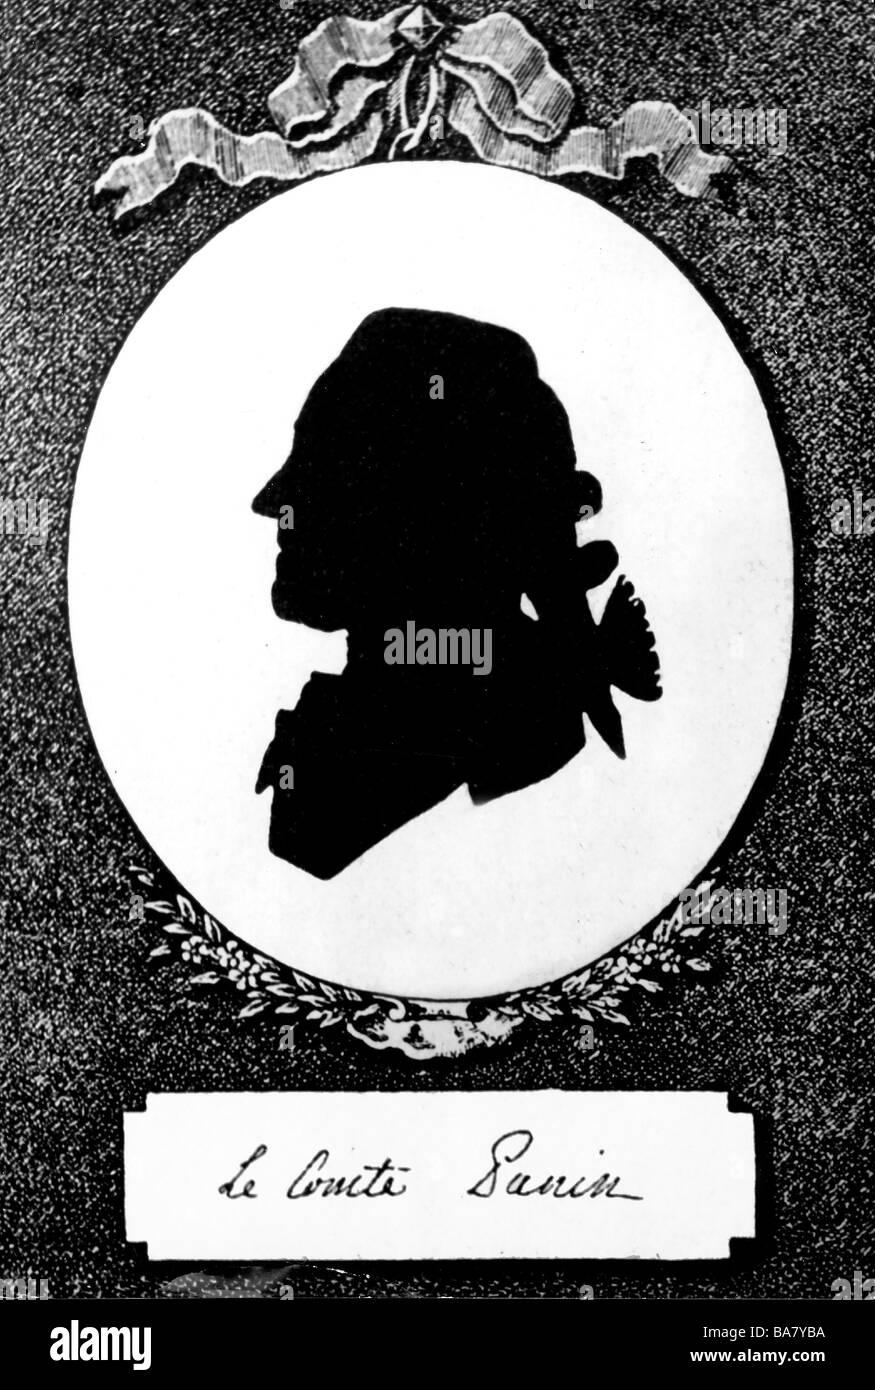 Panin, Nikita Ivanovich, 26.9.1718 - 20.3.1783, Russian politician, Foreign Minister 1763 - 1783, portrait, silhouette, - Stock Image